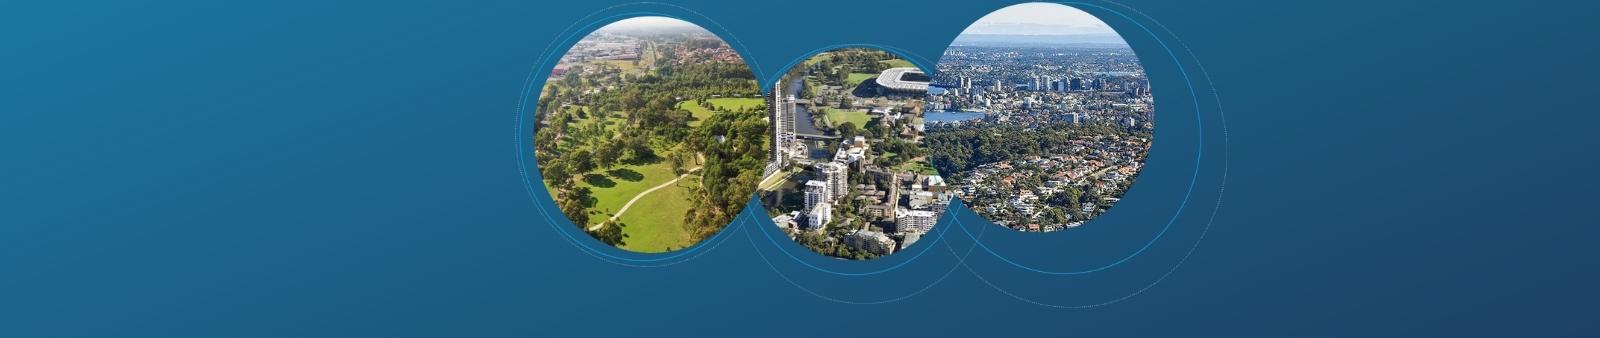 Next Steps for Greater Sydney